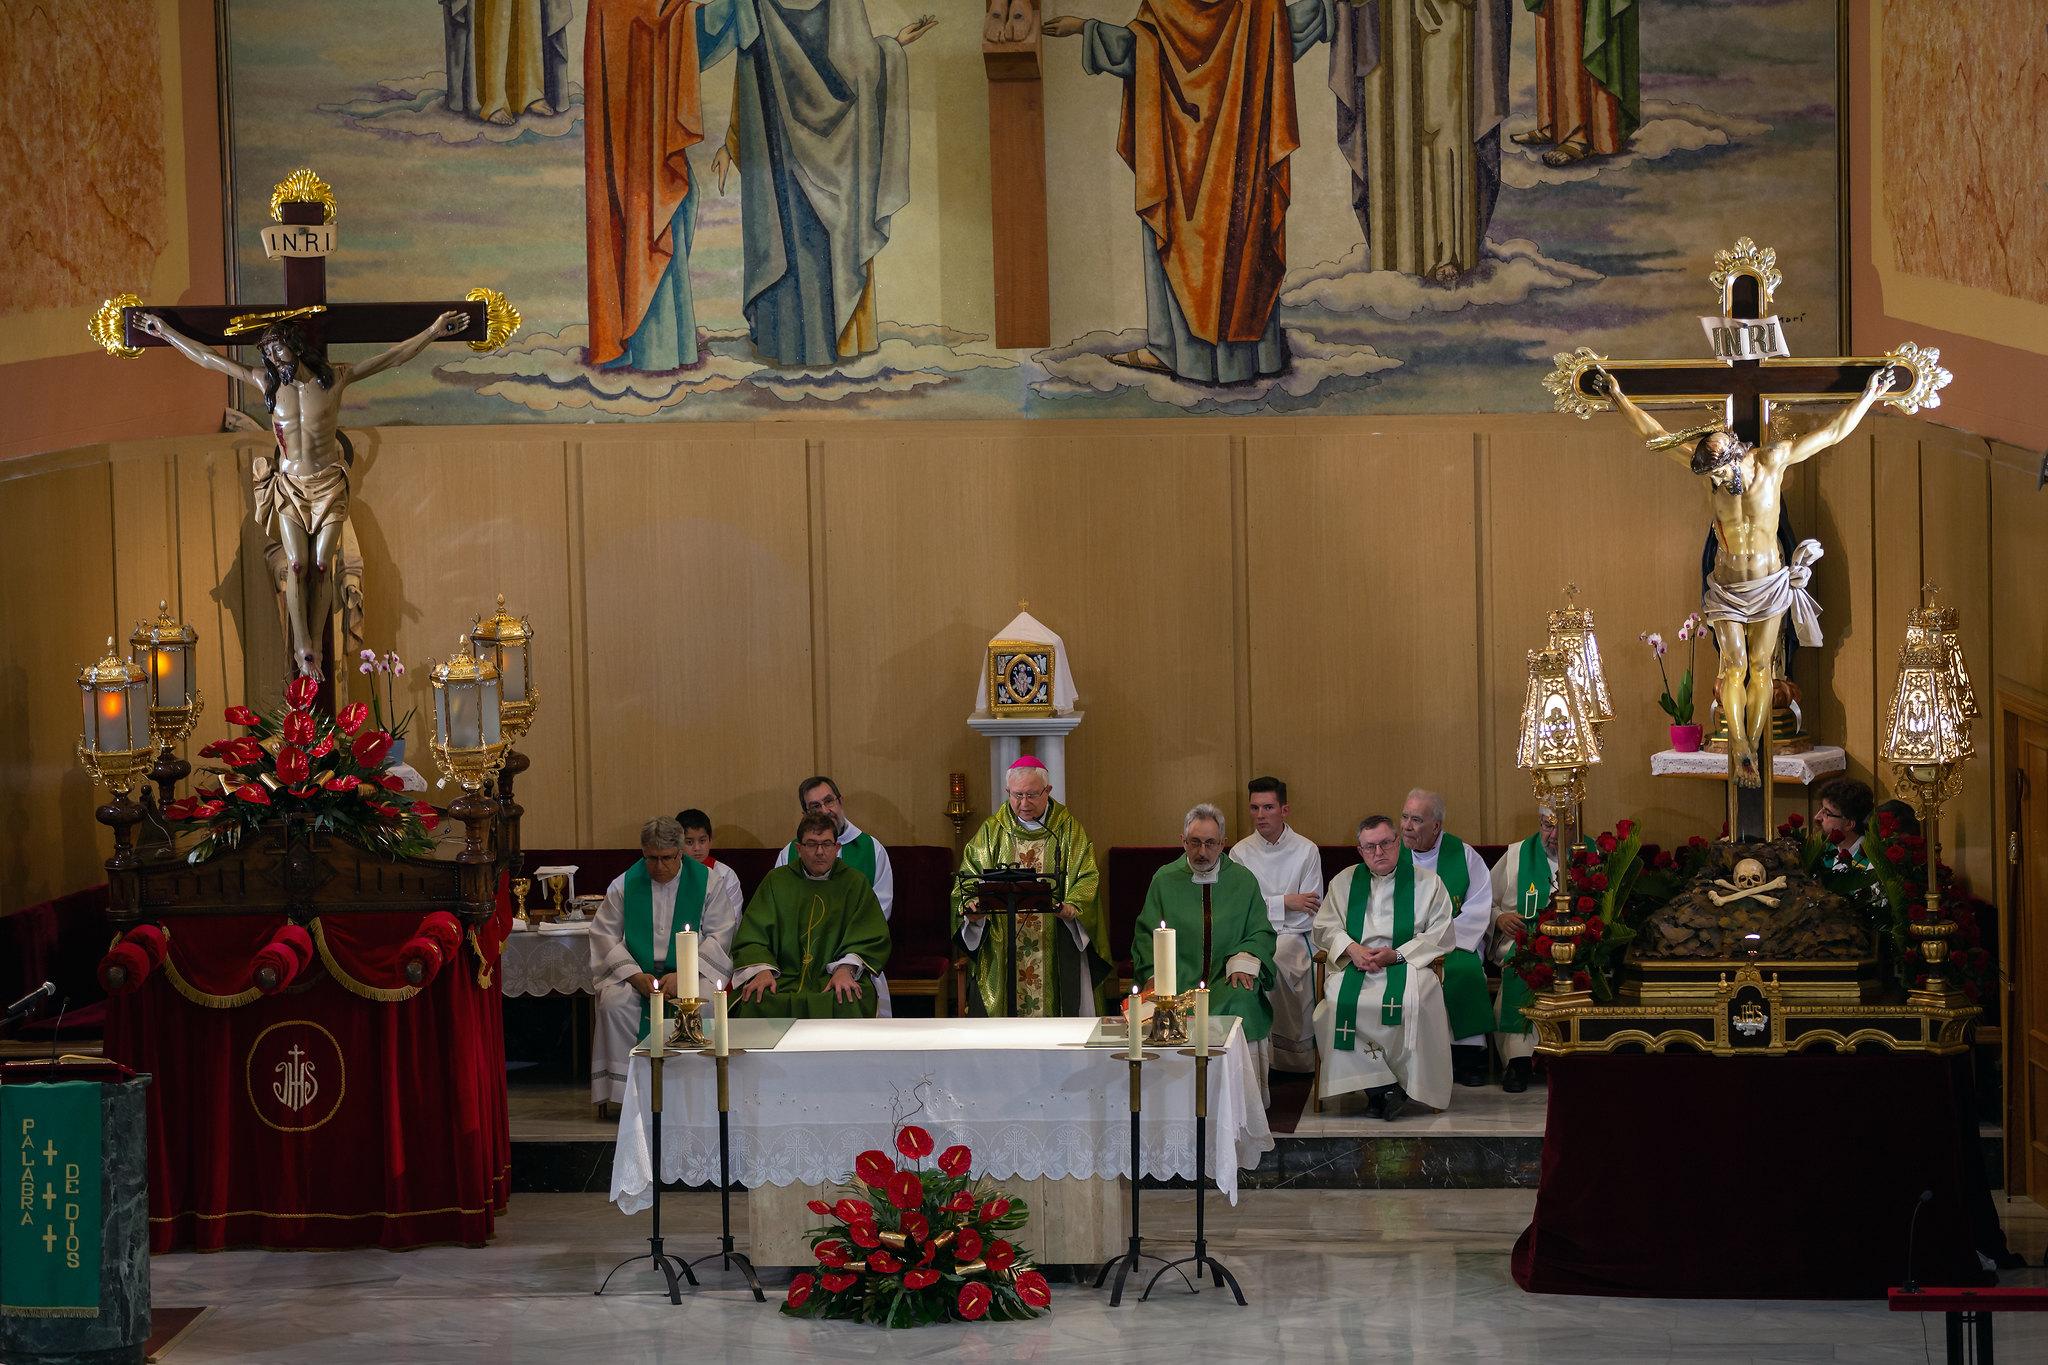 (2018-06-17) - 75 Aniversario - Encuentro - Vicent Olmos Navarro (09)